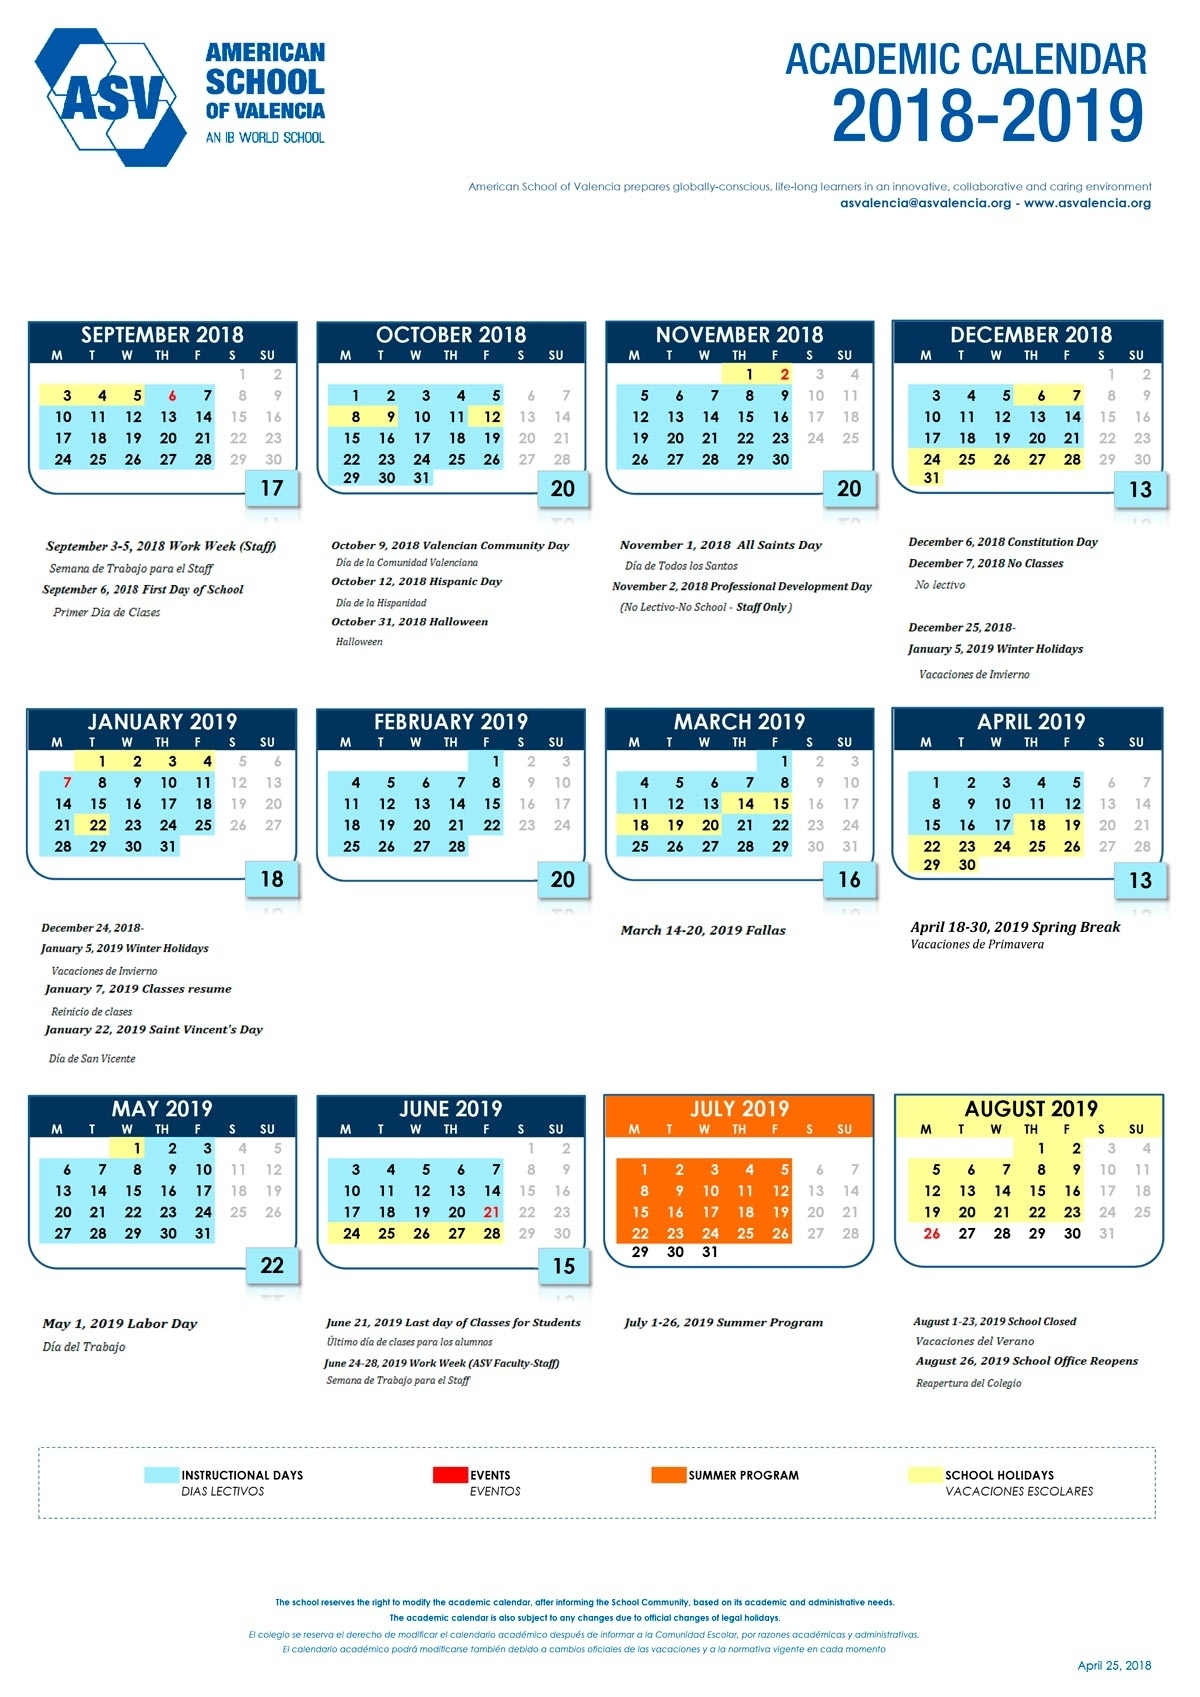 Nus 20192020 Academic Calendar  Calendar Inspiration Design pertaining to Nus Academic Calendar